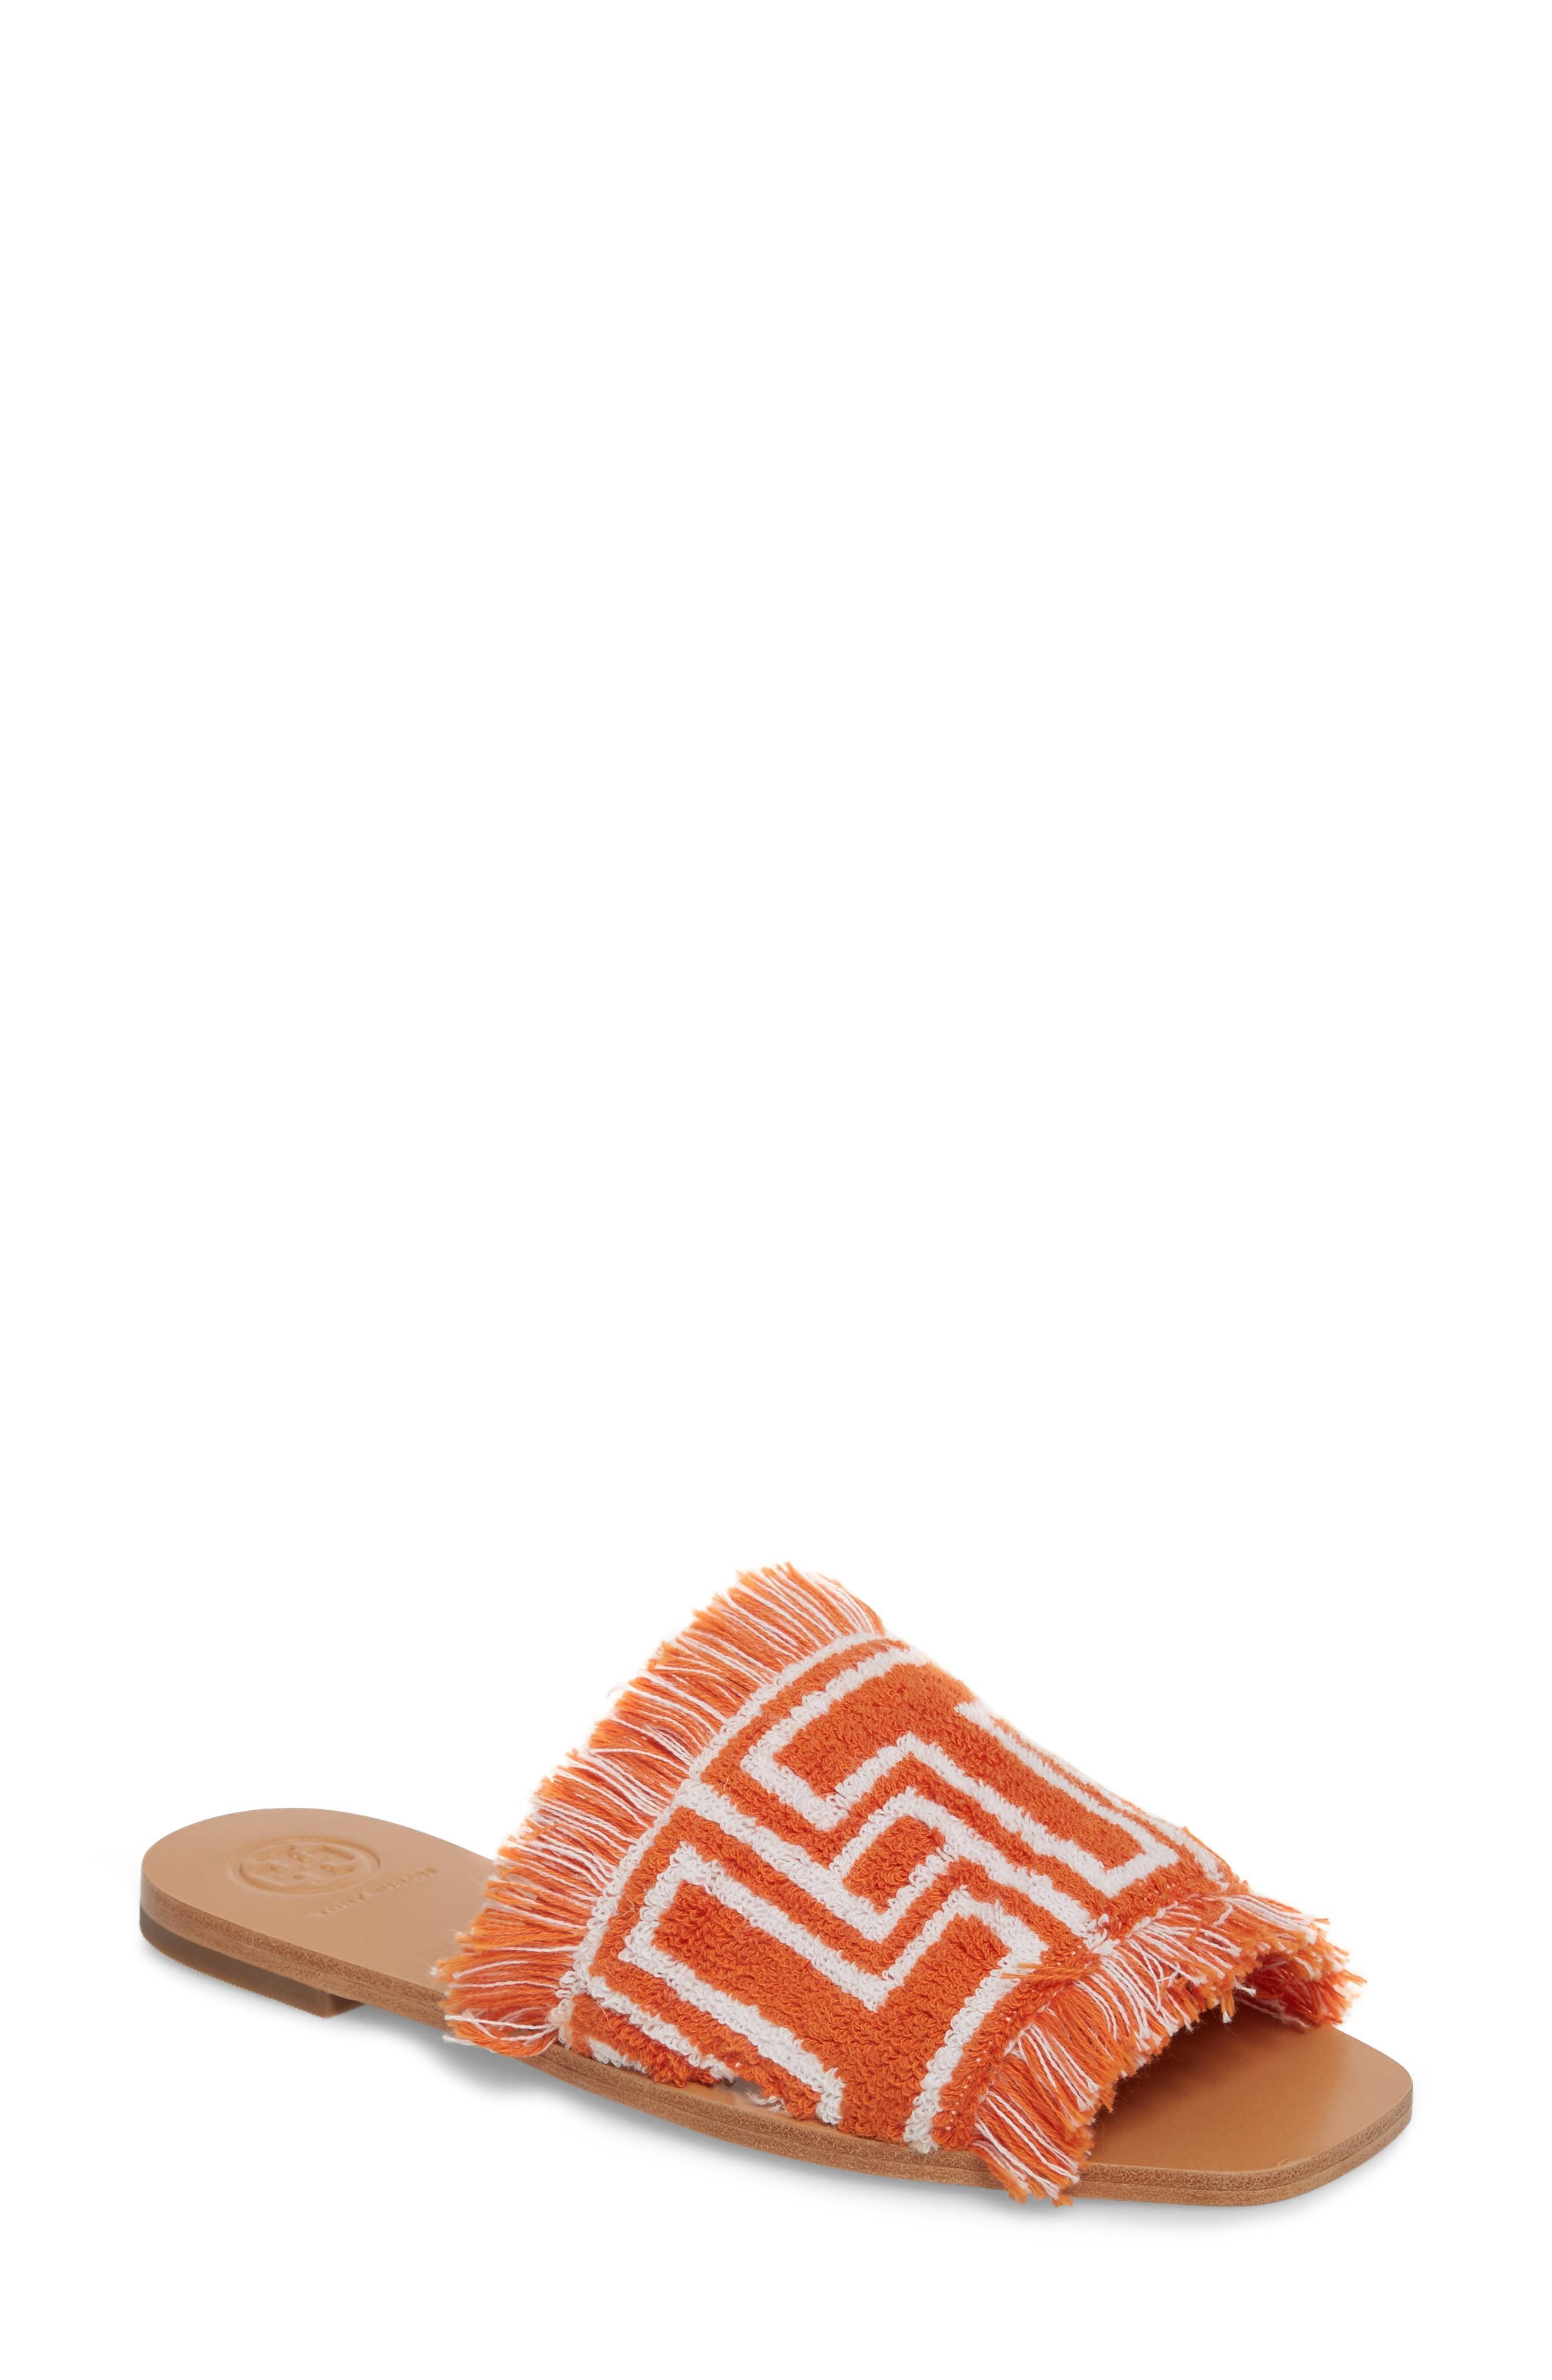 631dc95df0c1 Tory Burch Logo-Intarsia Terry Slides In Orange  Ivory